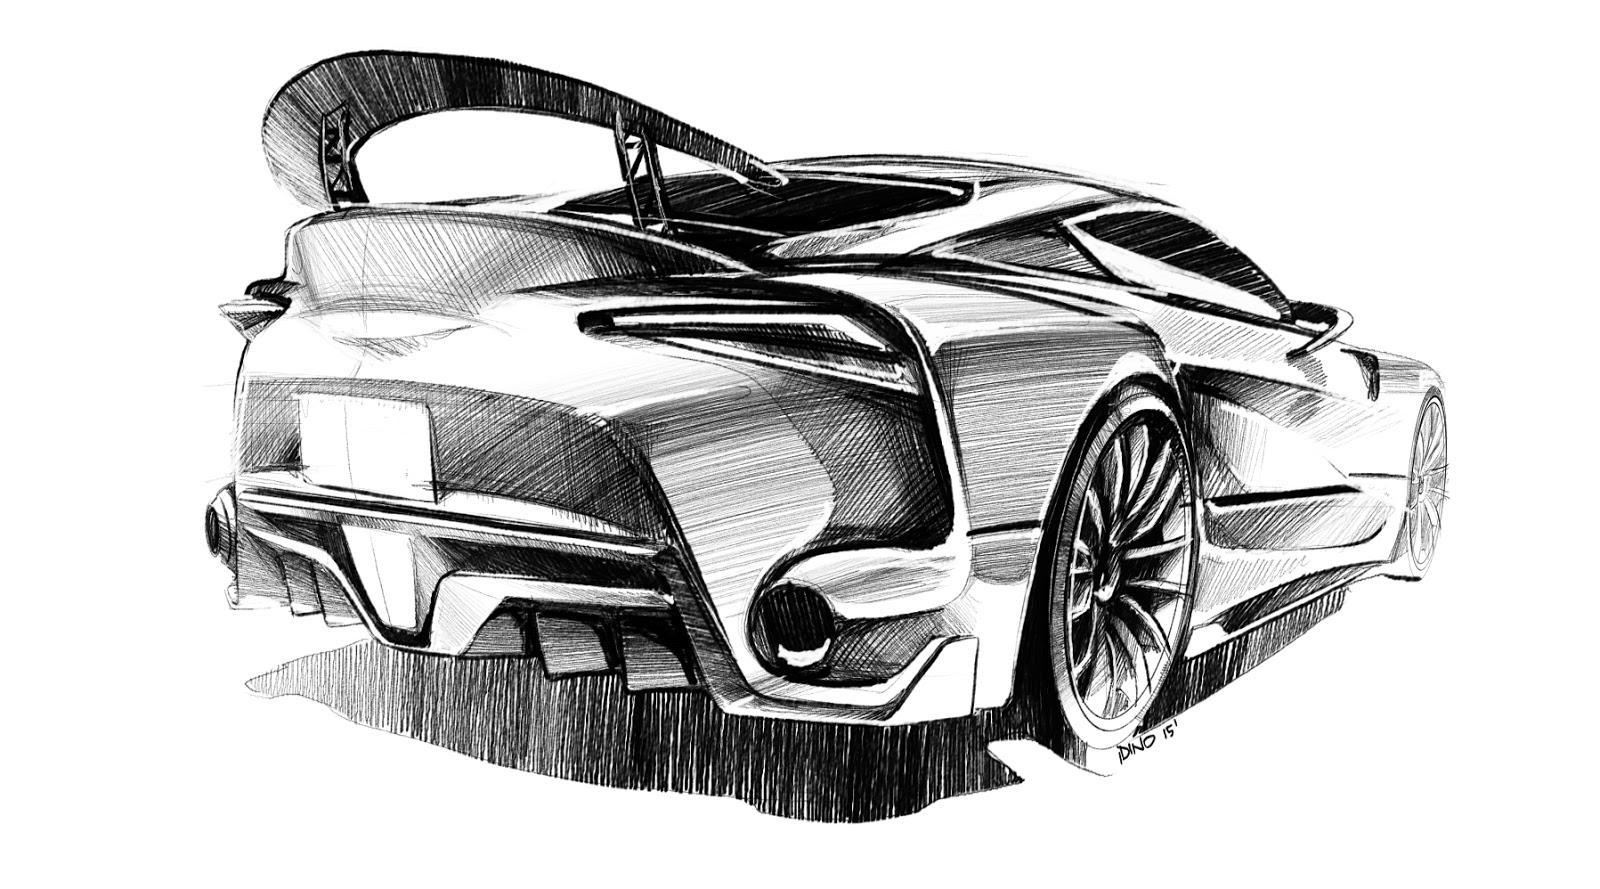 Design of a car pdf - Car Design Pro Brak Komentarzy